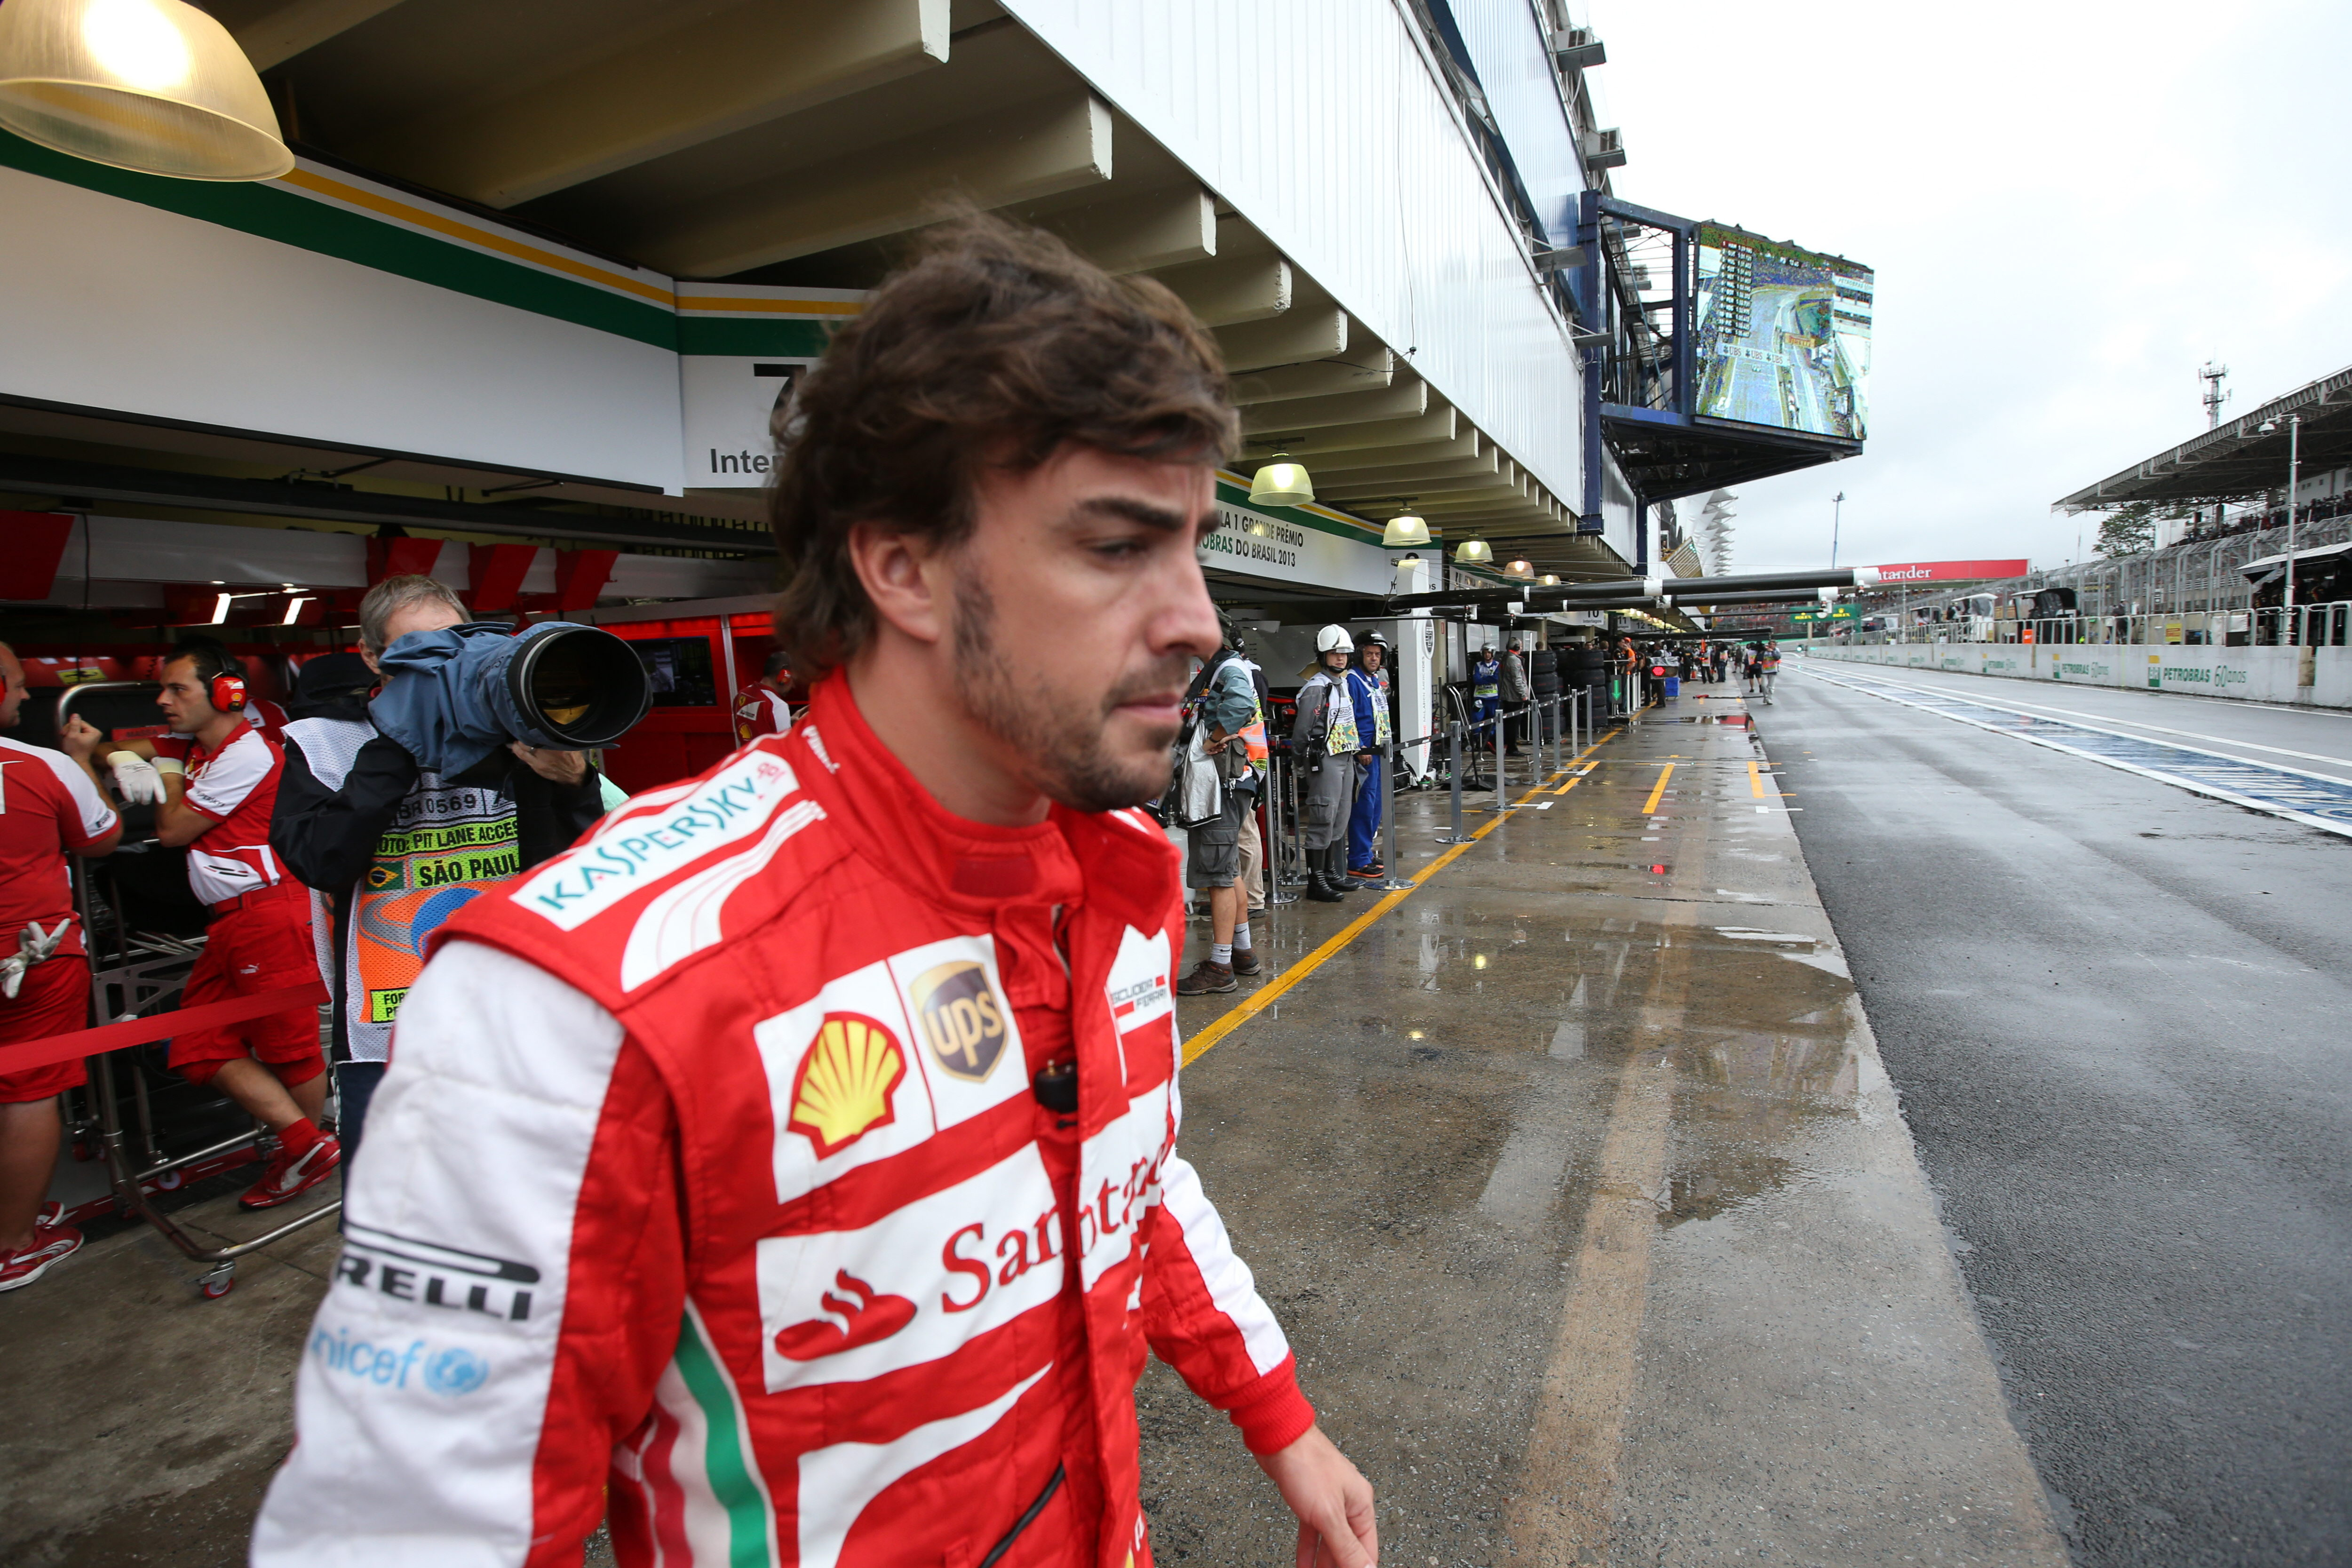 Alonso finaliza quinto los primeros test en Jerez a pesar del susto matinal